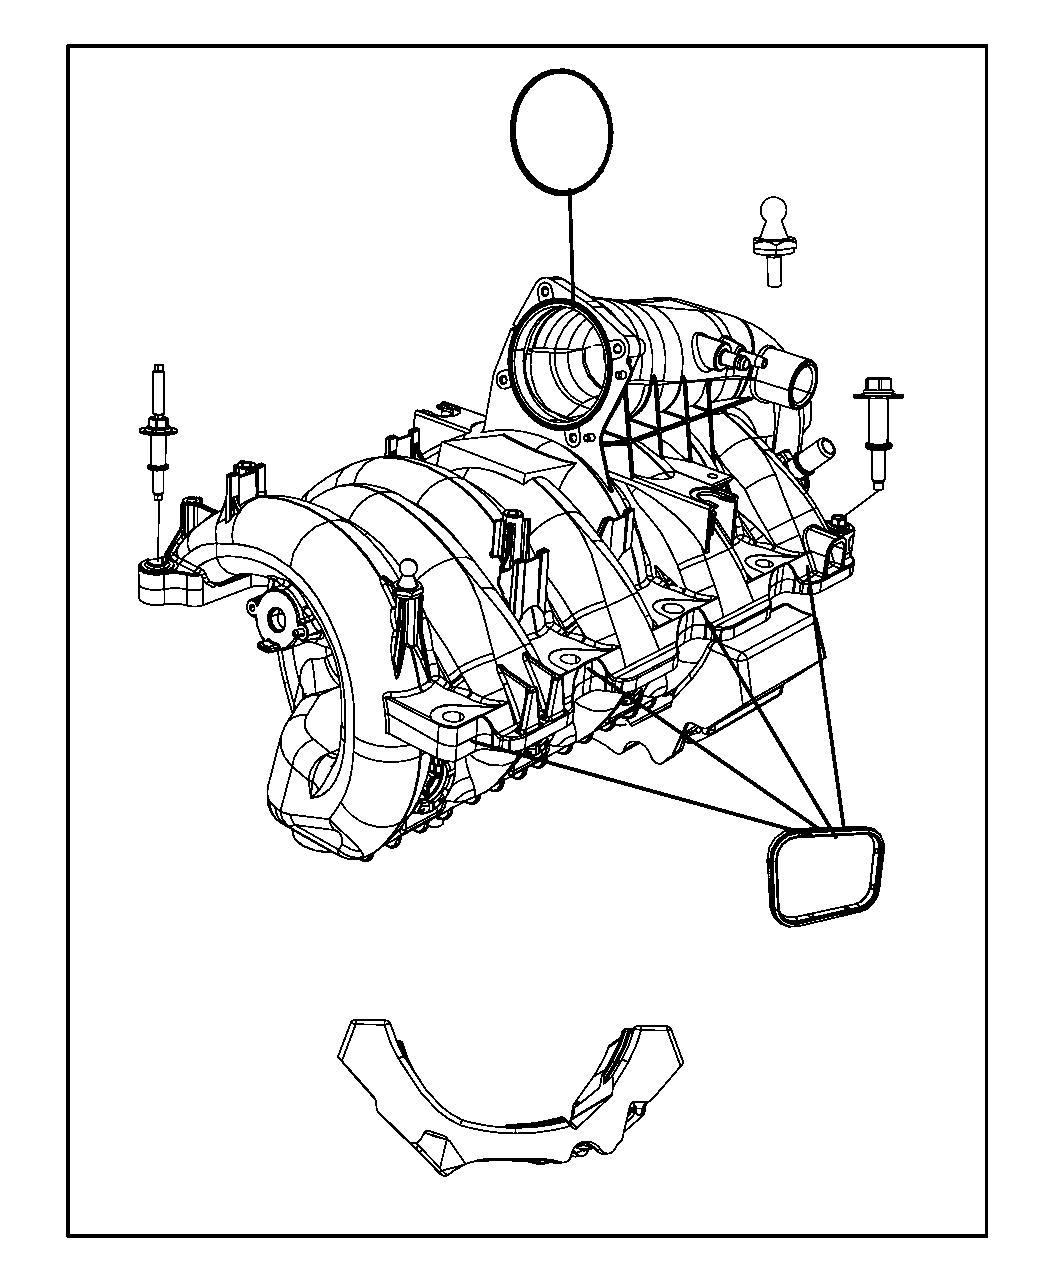 Dodge Ram Intake Manifold 4 7l 4 7l V8 Engine